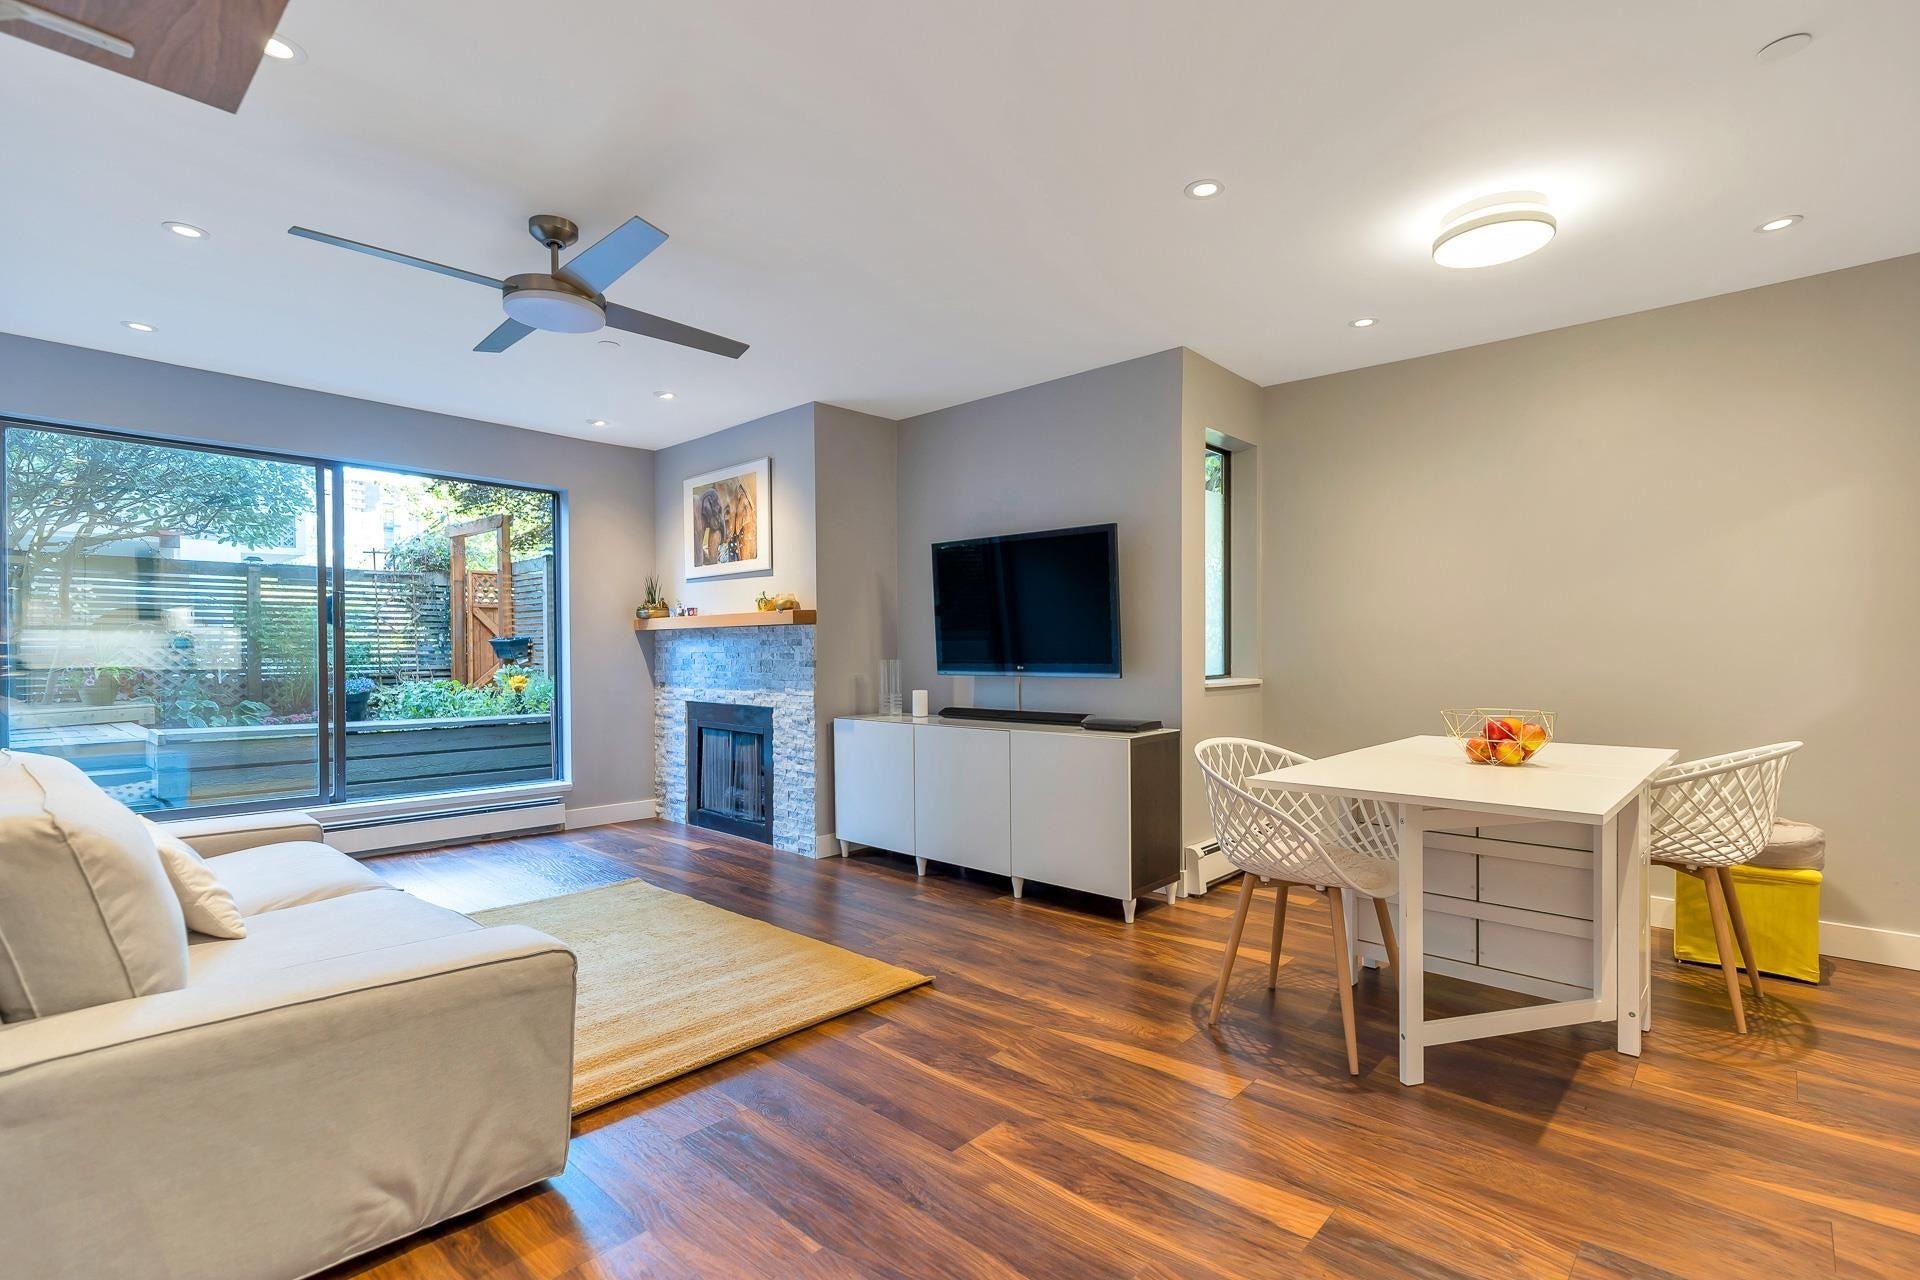 106 1340 DUCHESS AVENUE - Ambleside Apartment/Condo for sale, 2 Bedrooms (R2601274) - #1